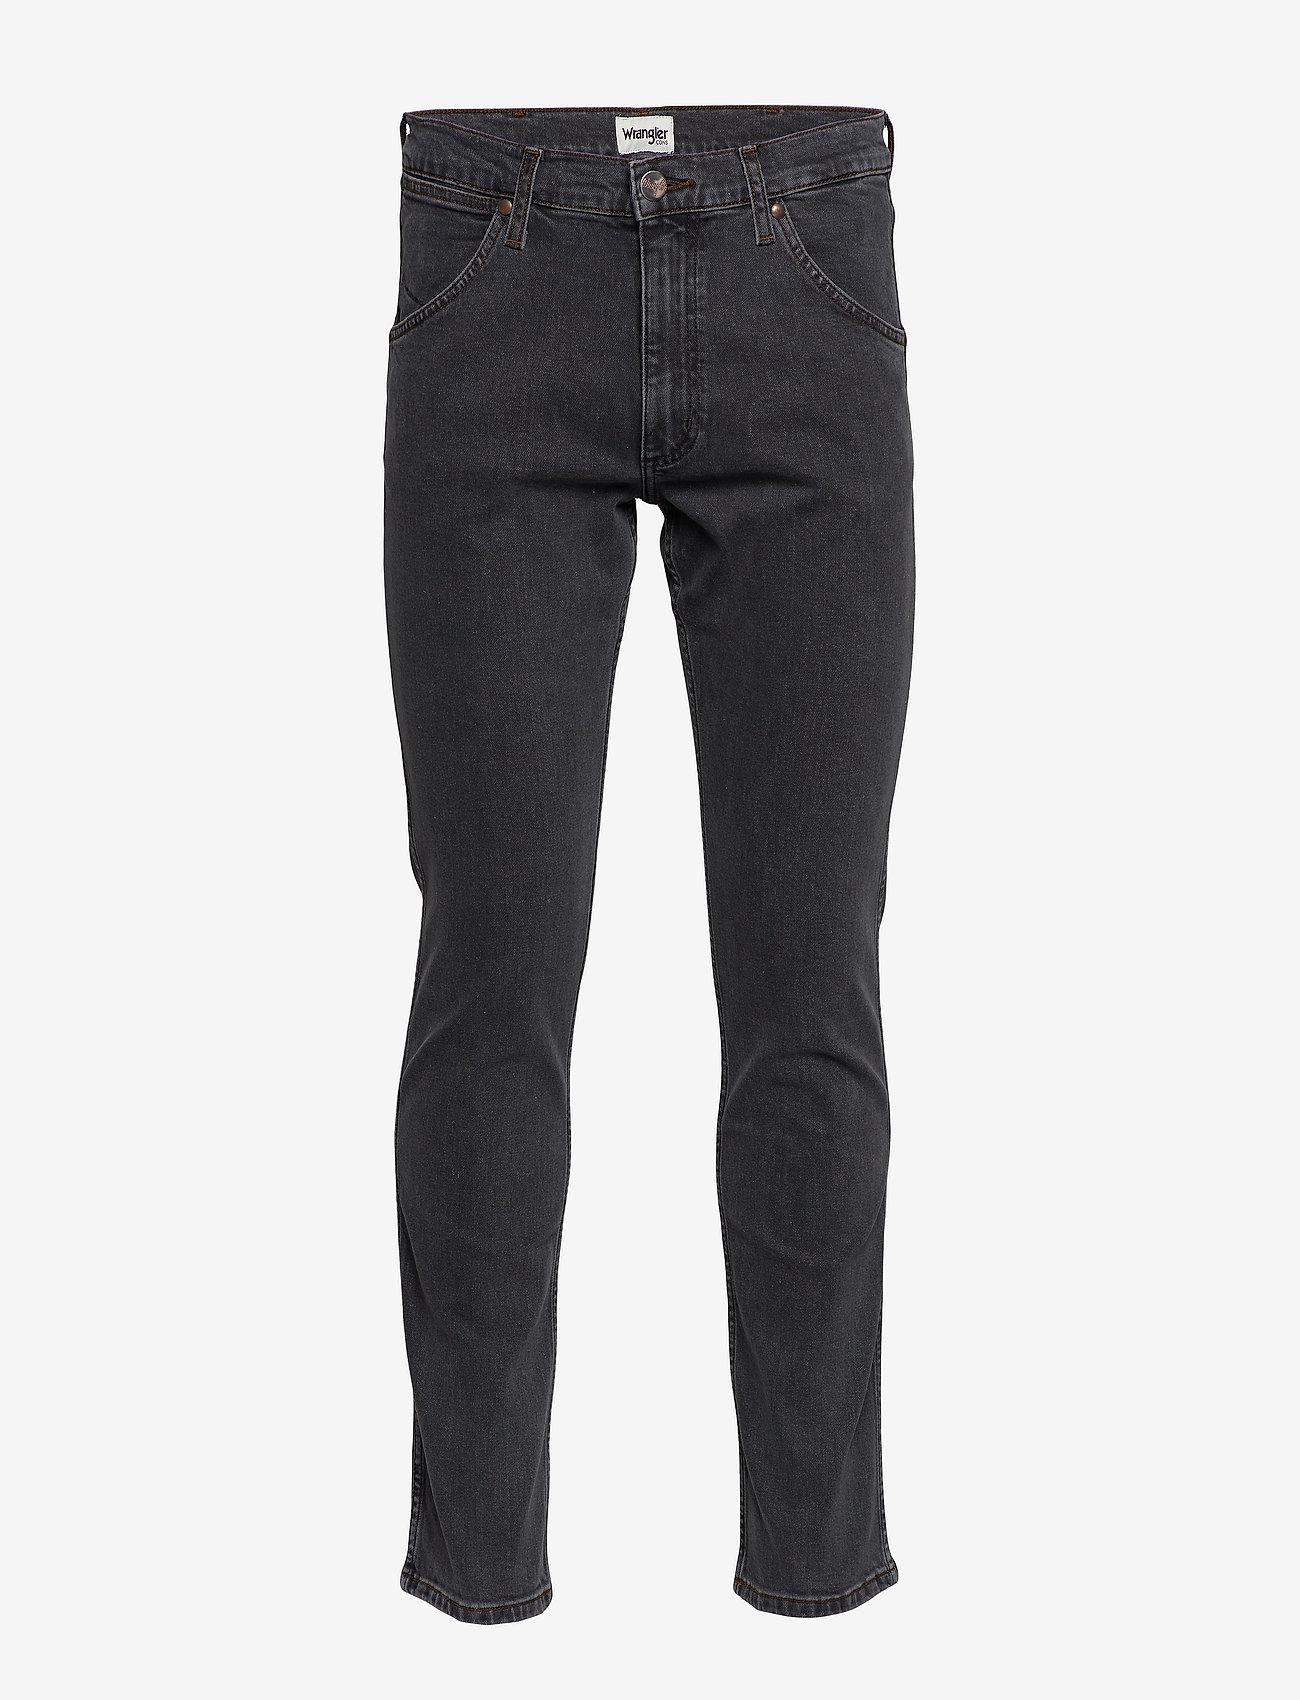 Wrangler 11MWZ - Jeans BLACK 2 YEARS x4xwE1Jr